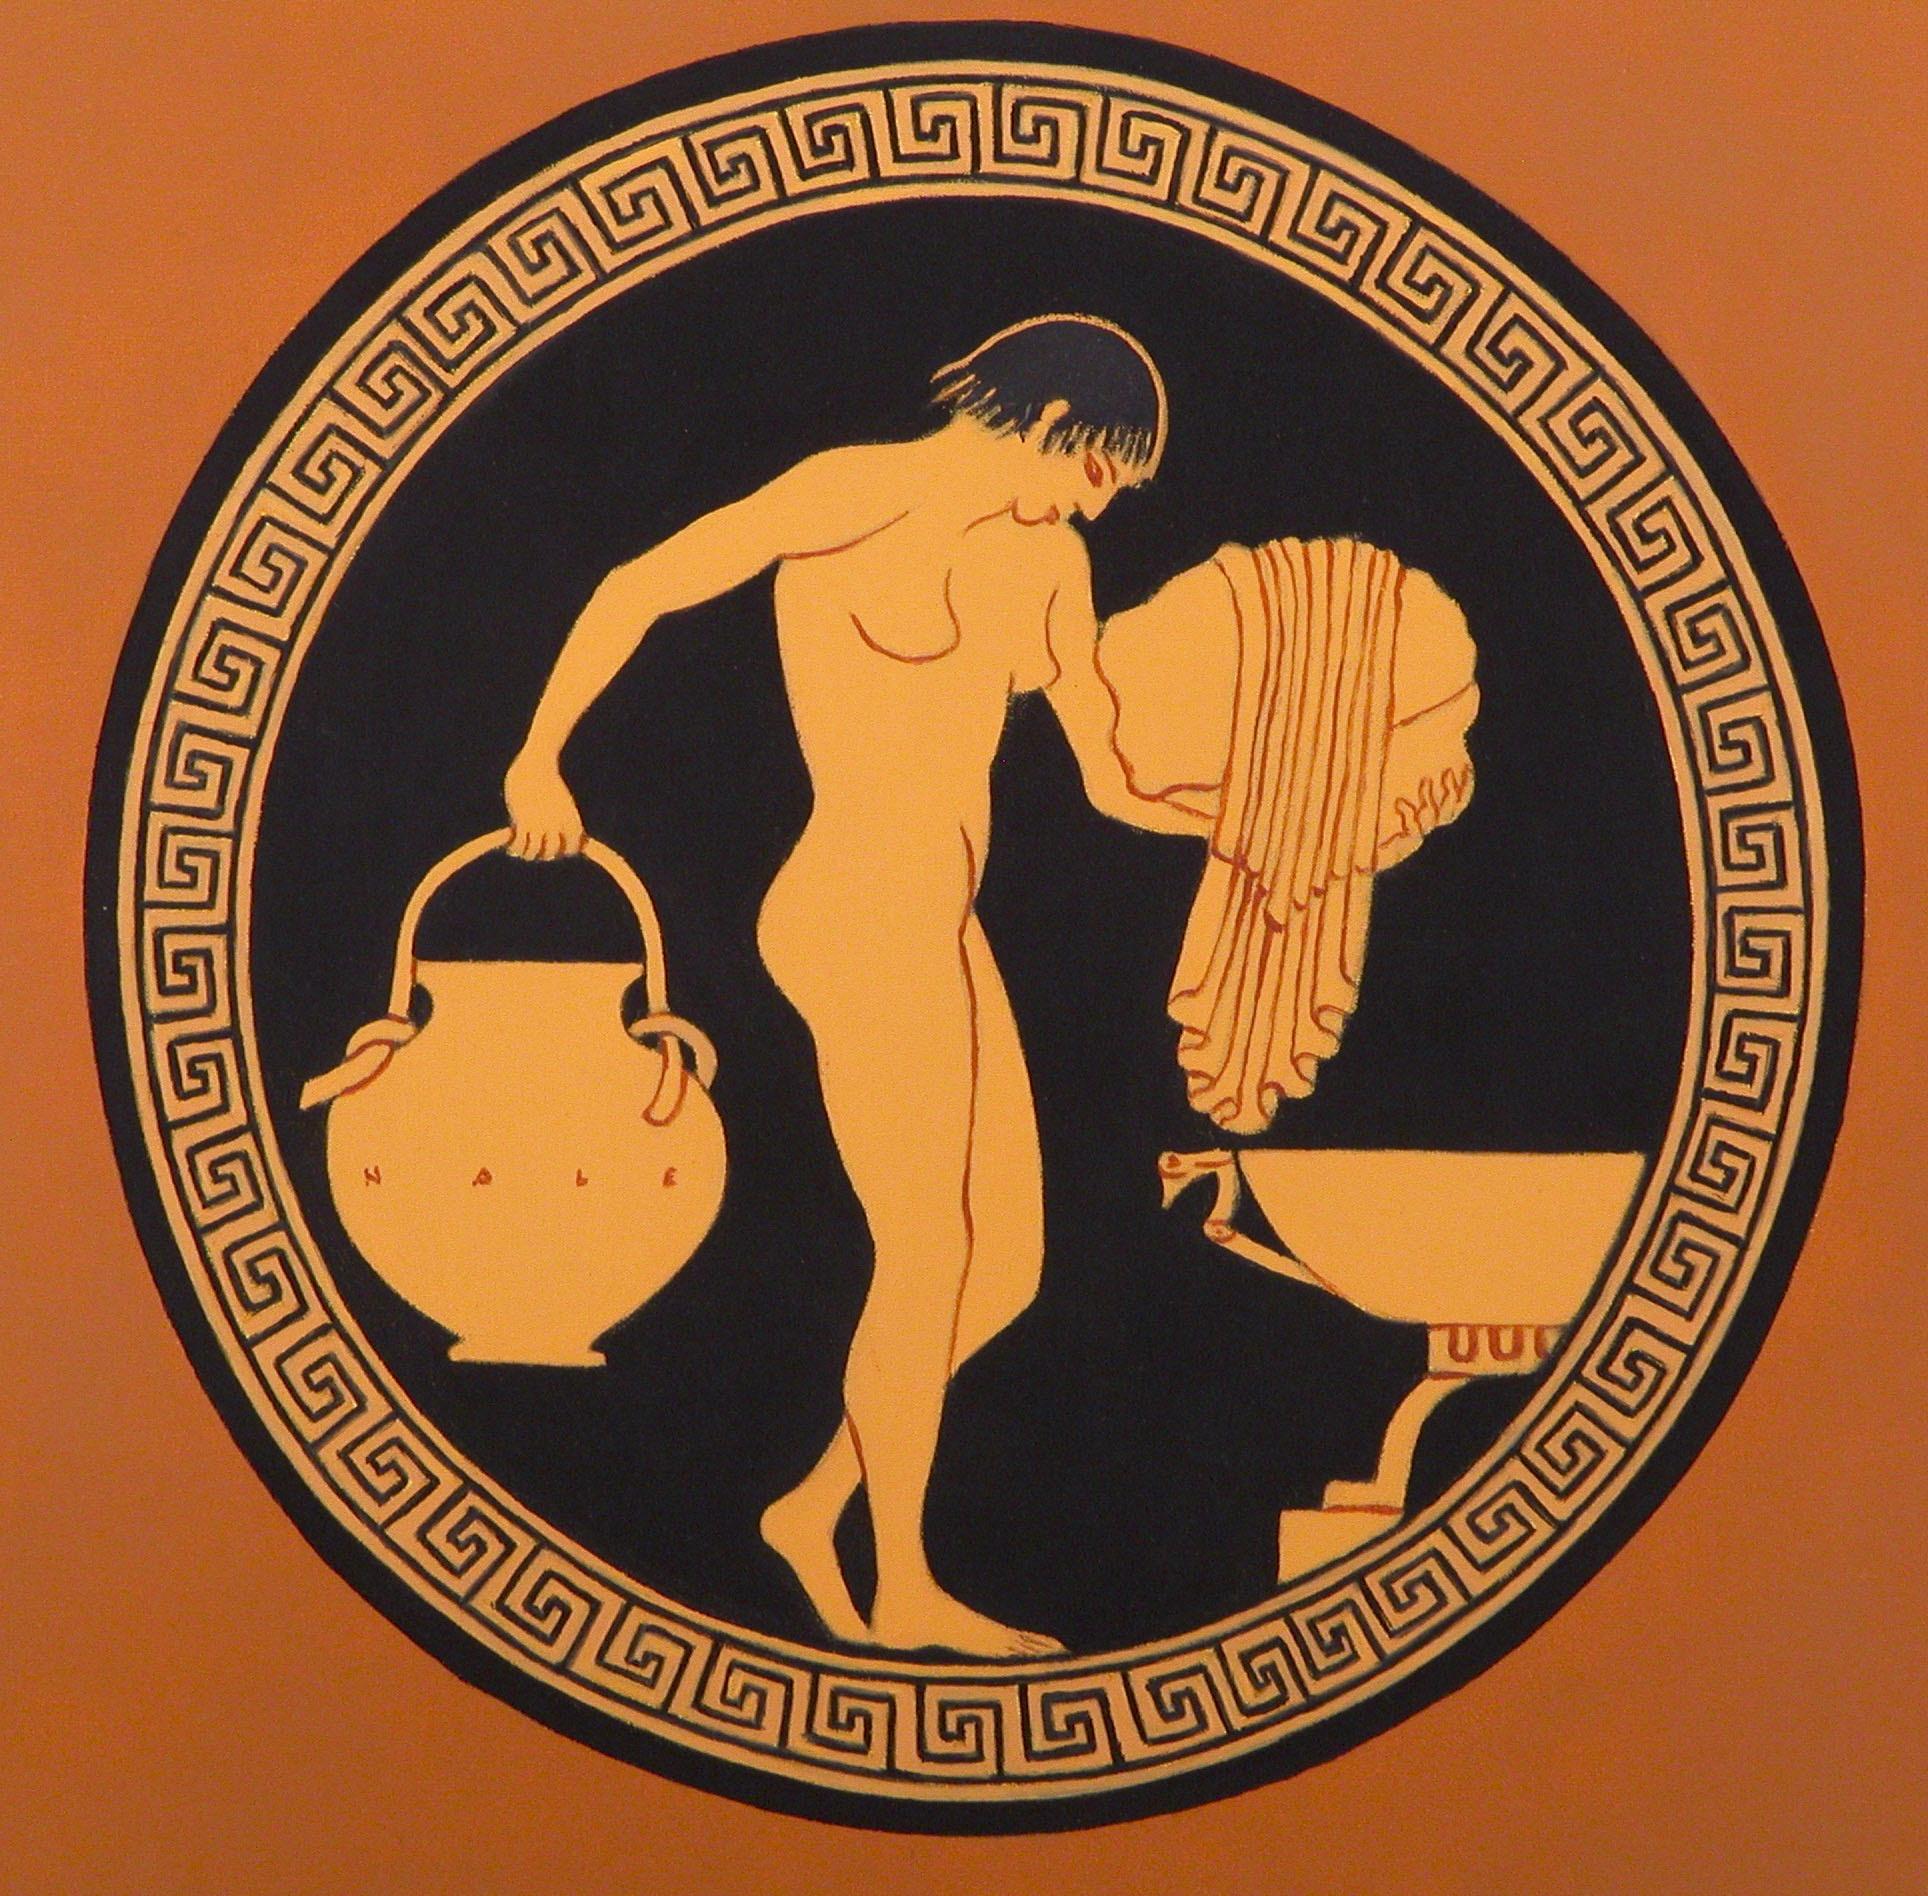 2007 roberta rossi – Figura femminile – olio su tavola – 25 x 25